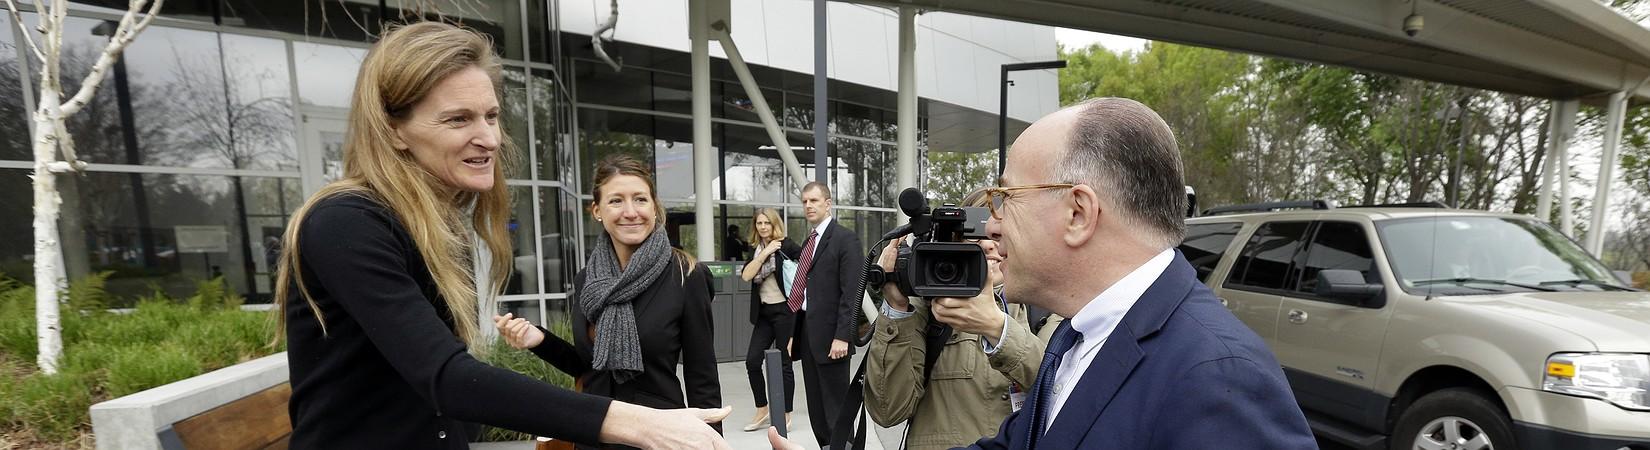 Uber's PR head latest to join executive exodus